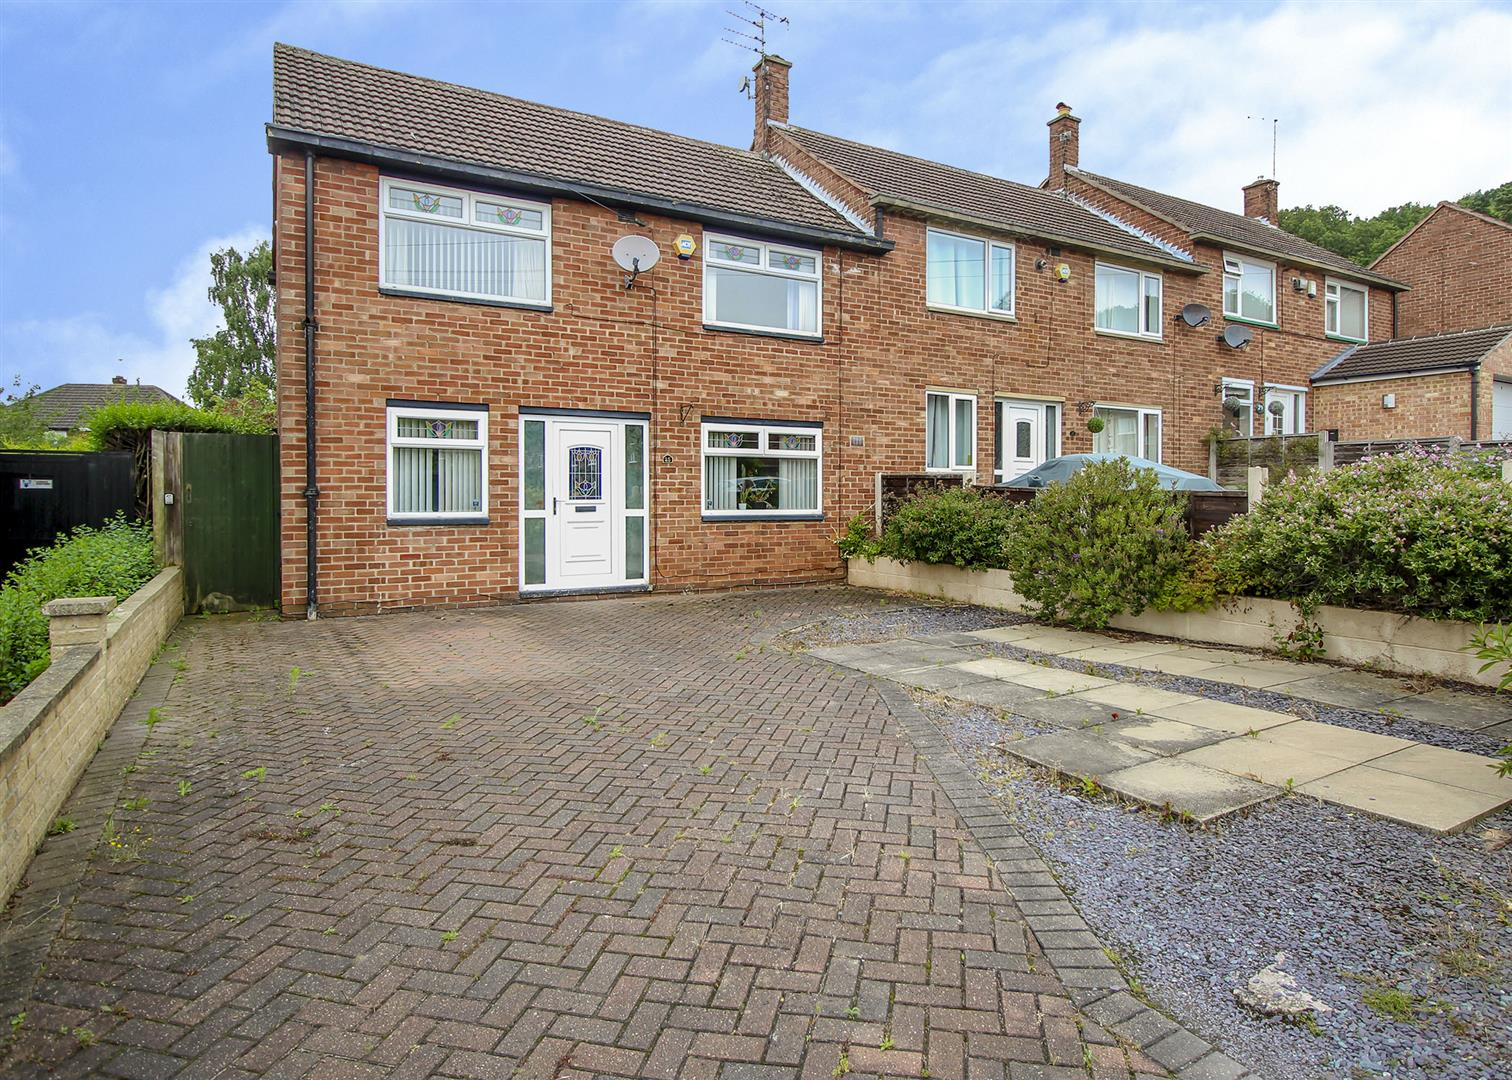 3 Bedrooms Property for sale in Longden Close, Bramcote